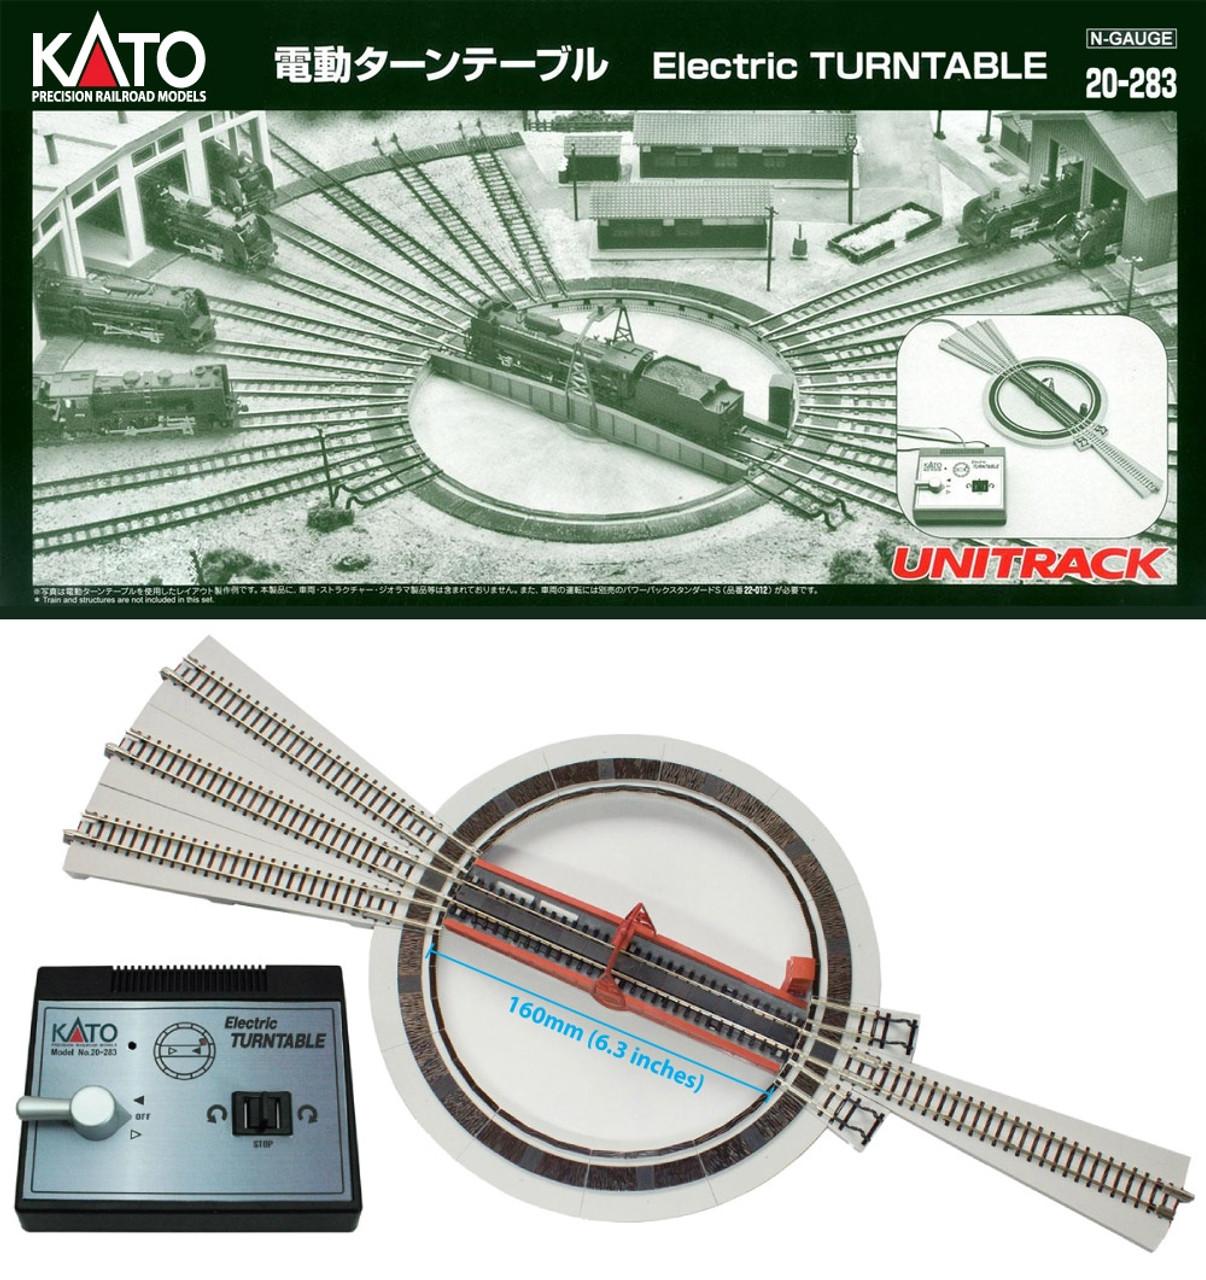 kato n 20 283 motorized turntable dcc friendly modeltrainstuff comkato n 20283 motorized turntable [ 1206 x 1280 Pixel ]